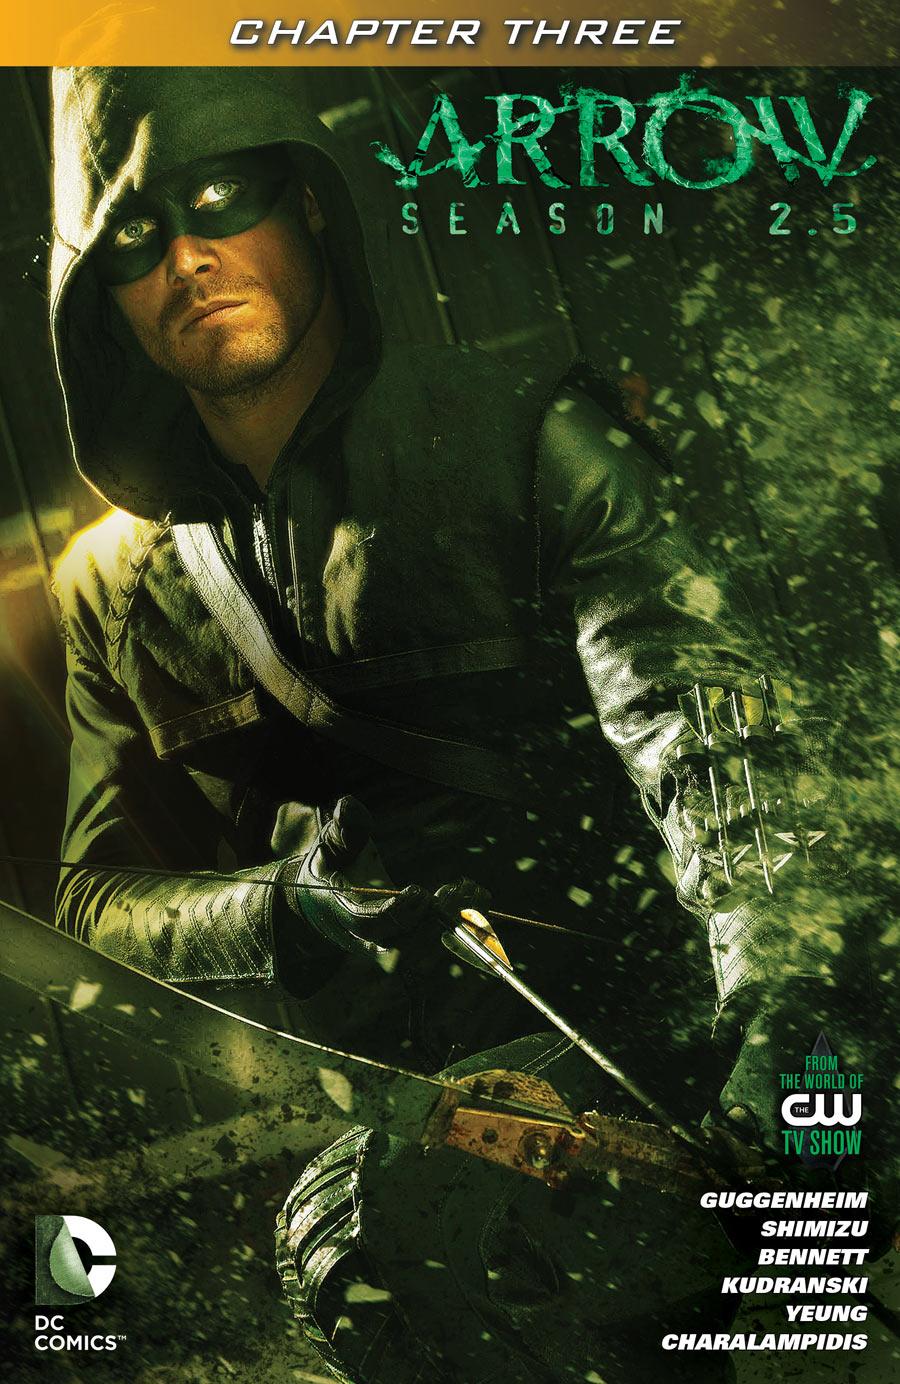 Arrow Season 2.5 chapter 3 digital cover.png